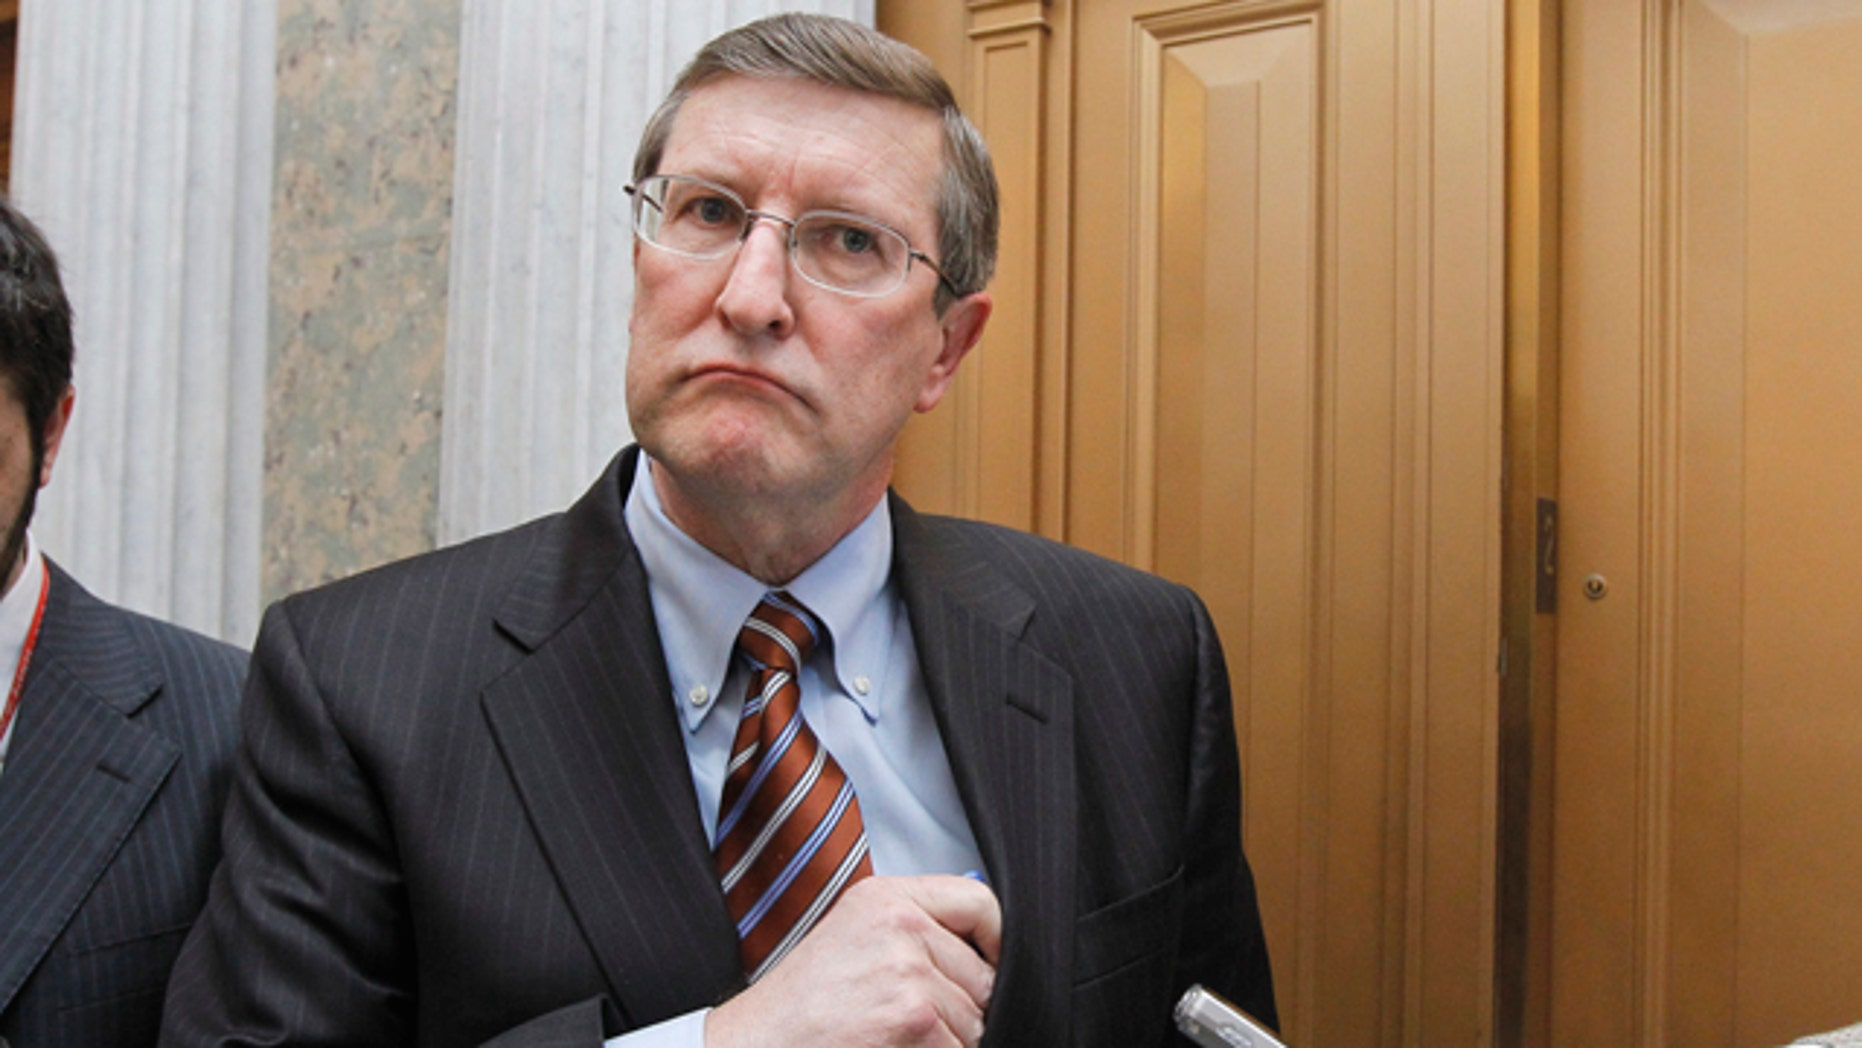 Senate Budget Committee Chairman Sen. Kent Conrad, D-N.D., talks to reporters on Capitol Hill